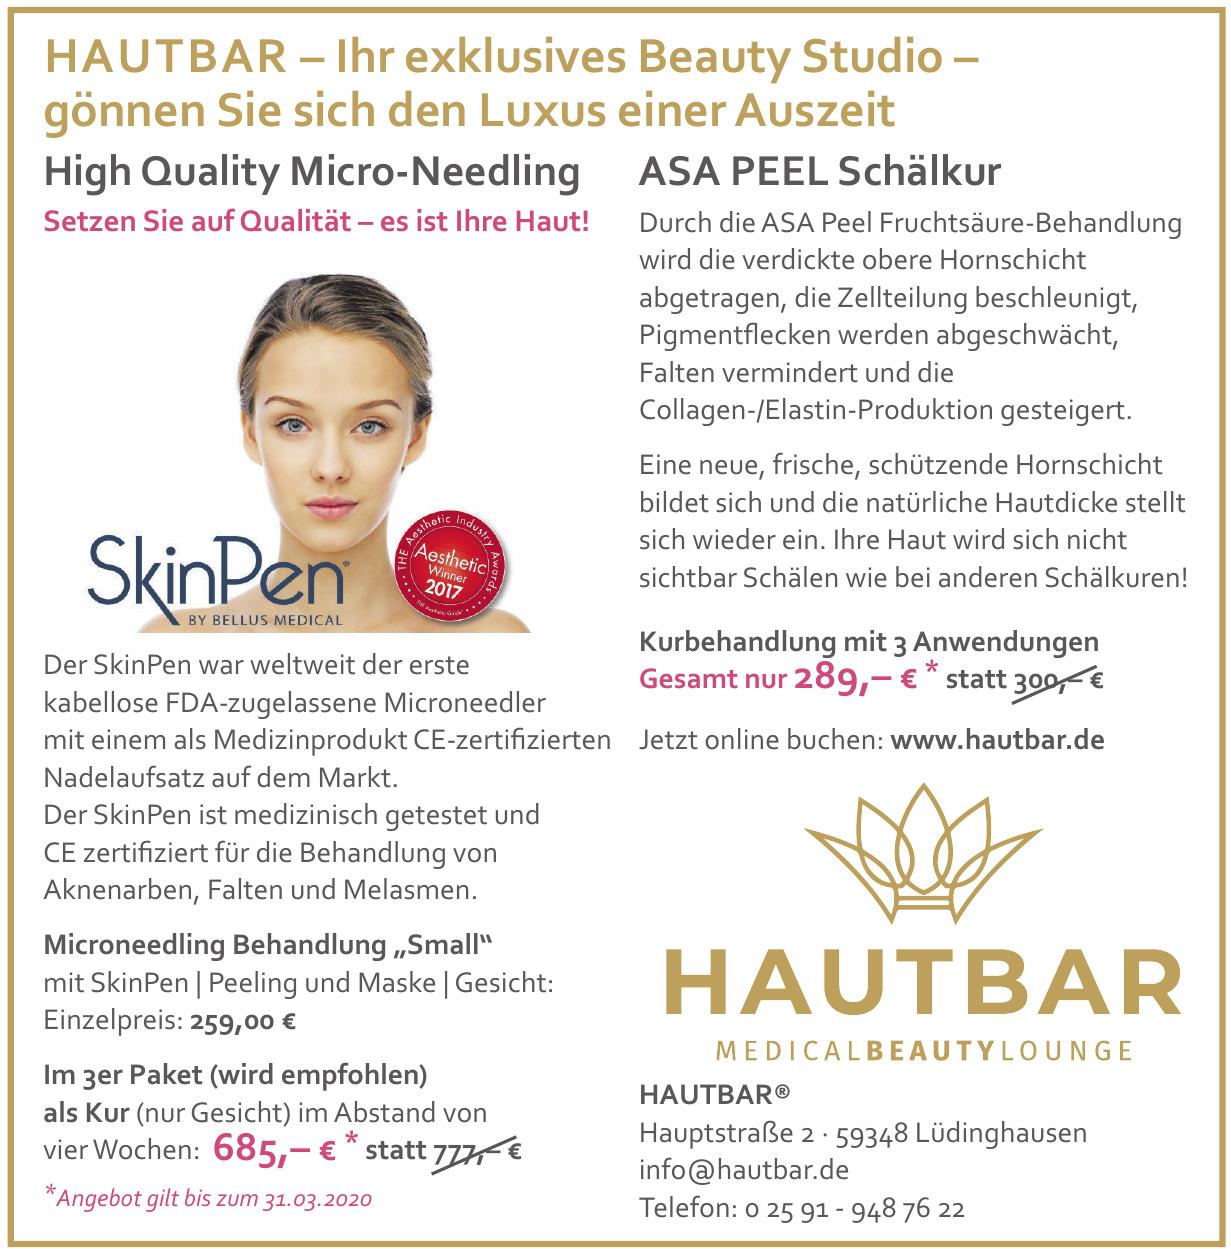 Hautbar Medical Beauty Lounge